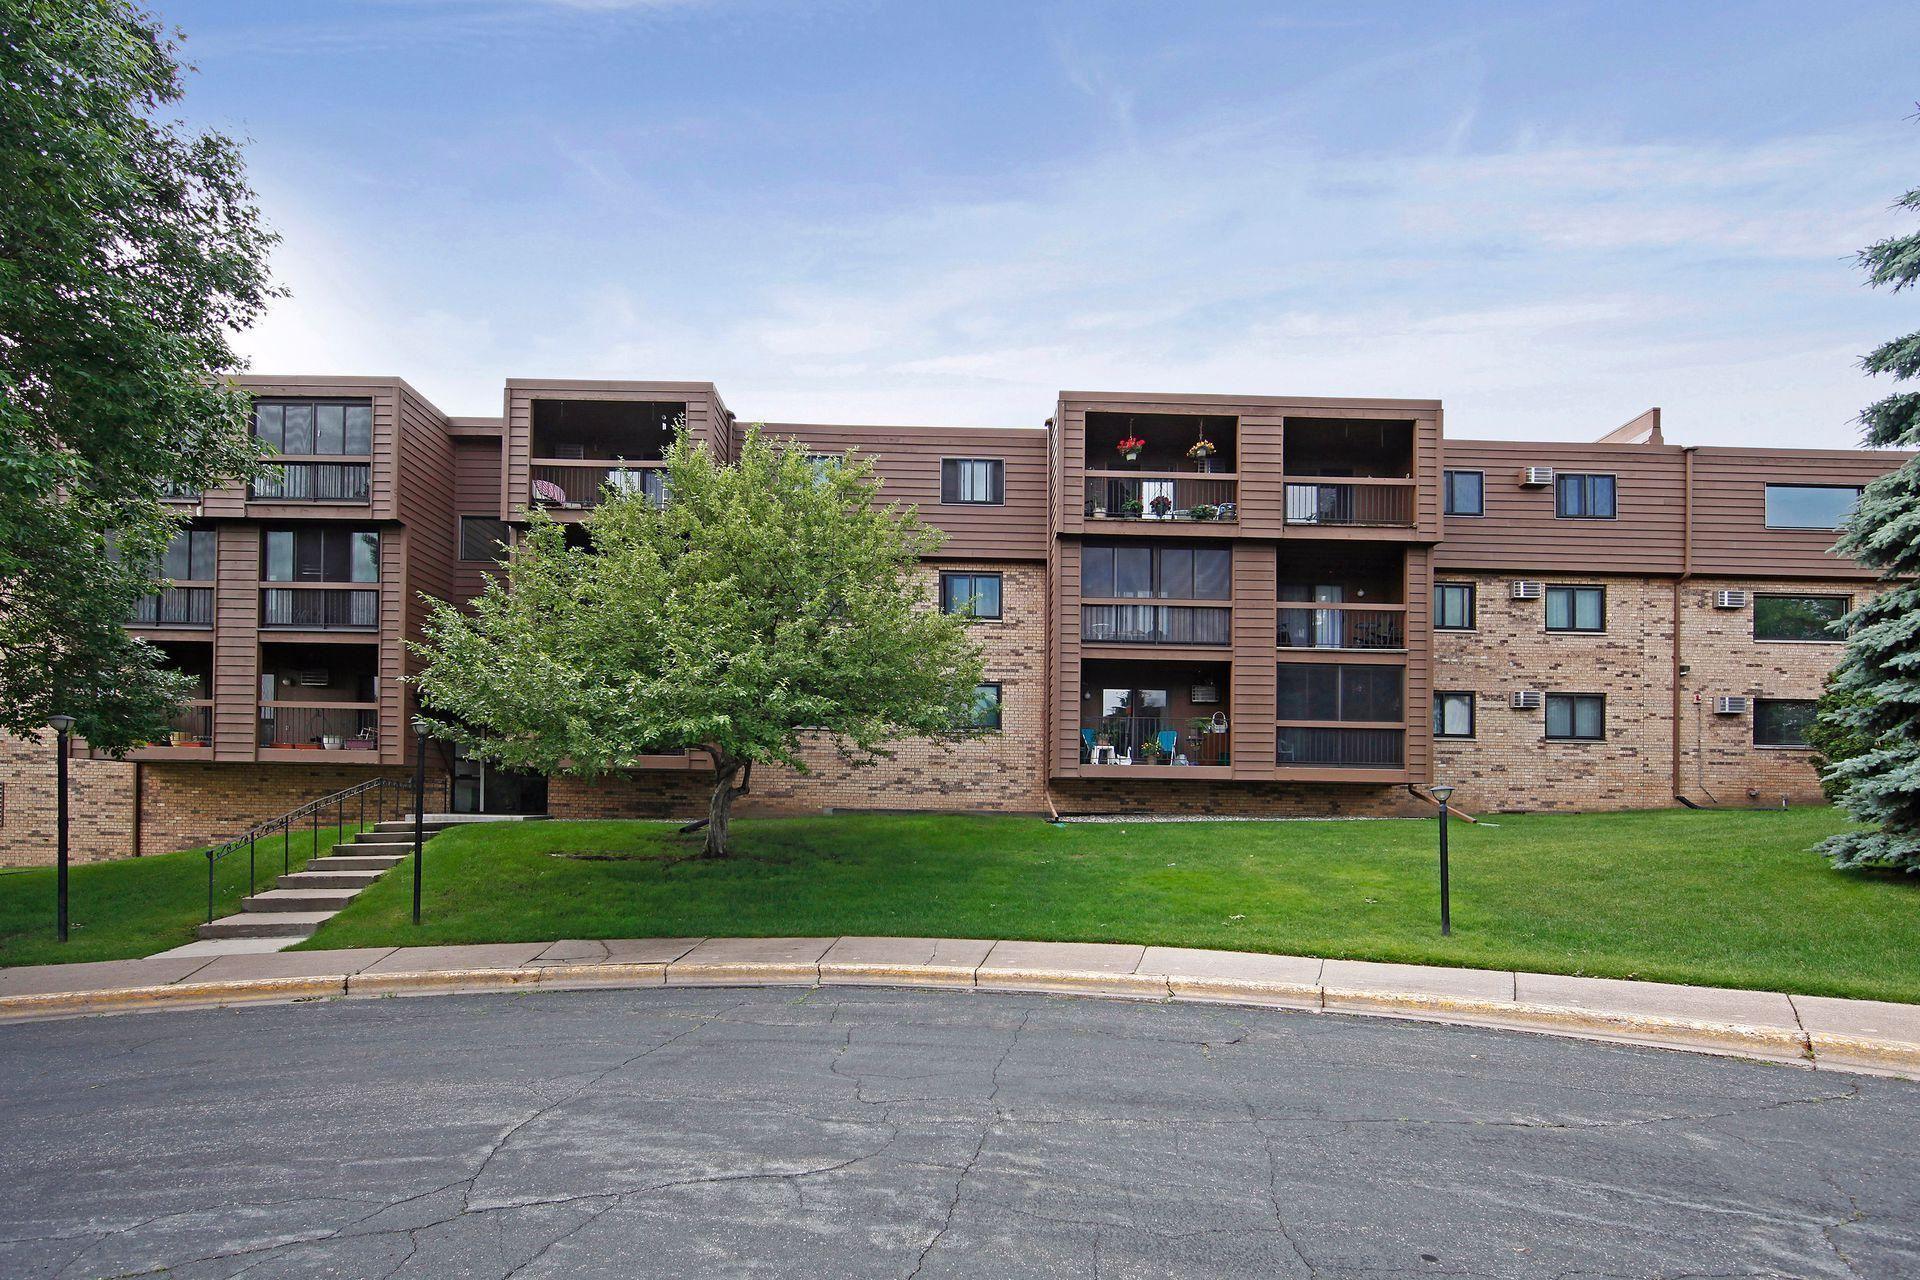 1000 41st Avenue NE #113, Columbia Heights, MN 55421 - MLS#: 5720021